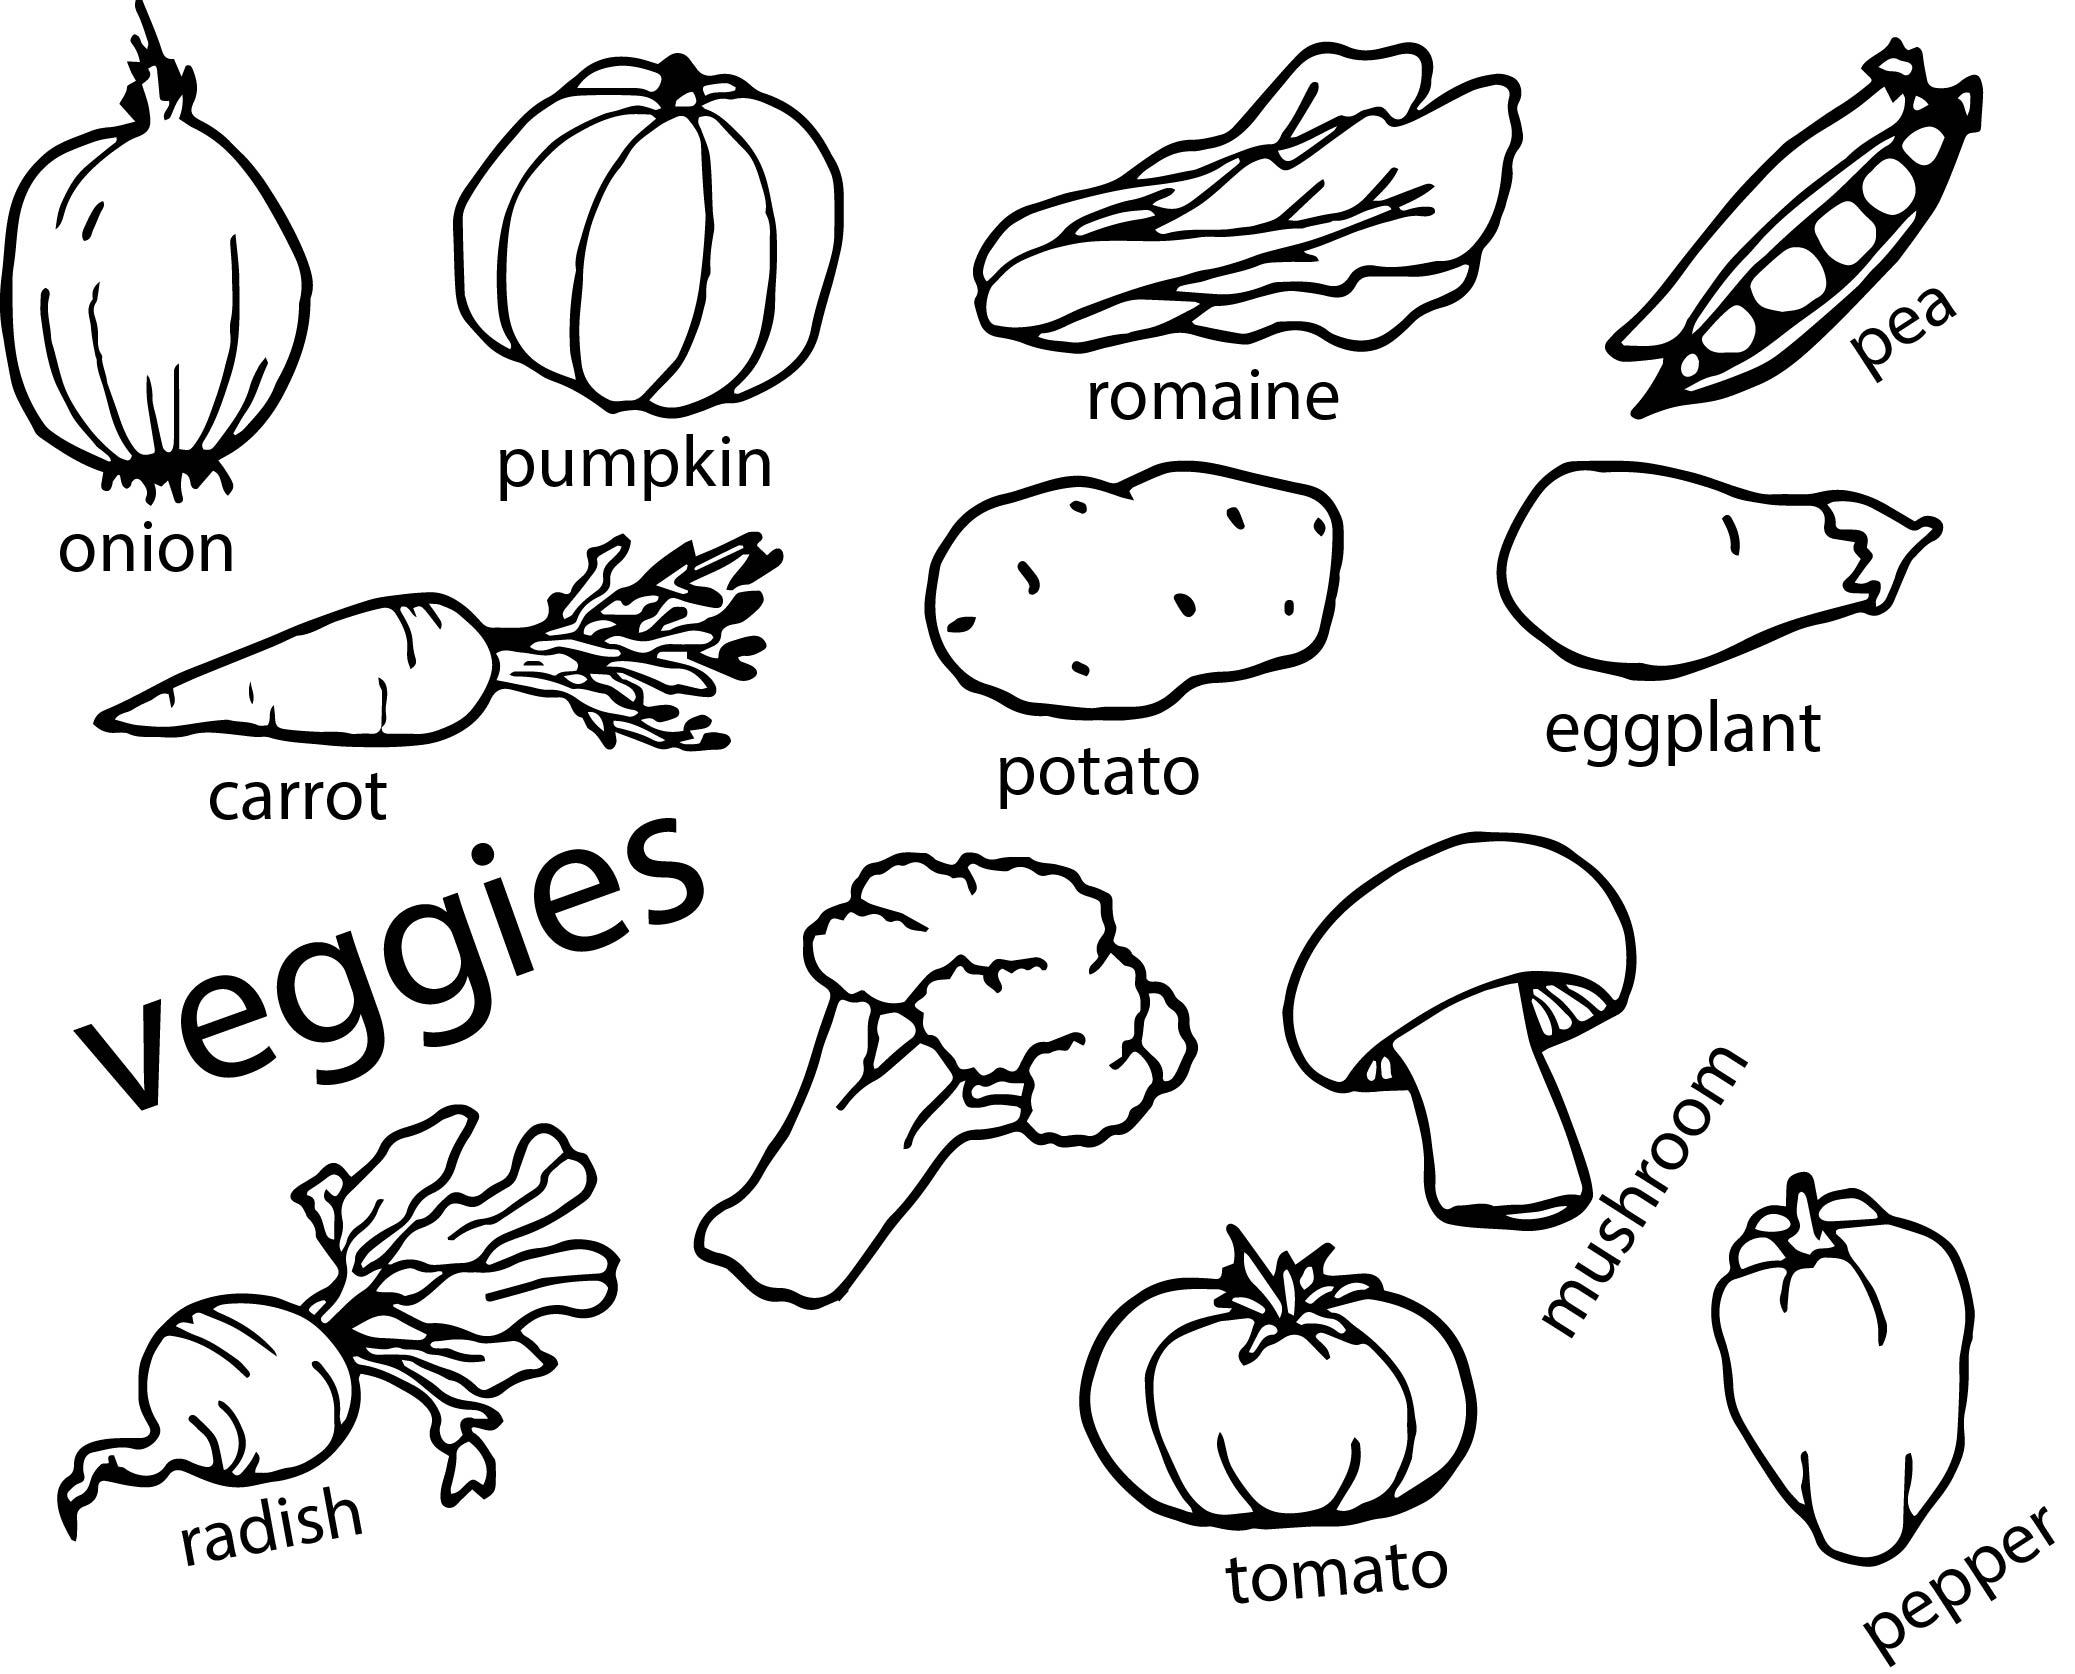 fruits and vegetables coloring book vegetables coloring page wecoloringpagecom coloring and book vegetables fruits